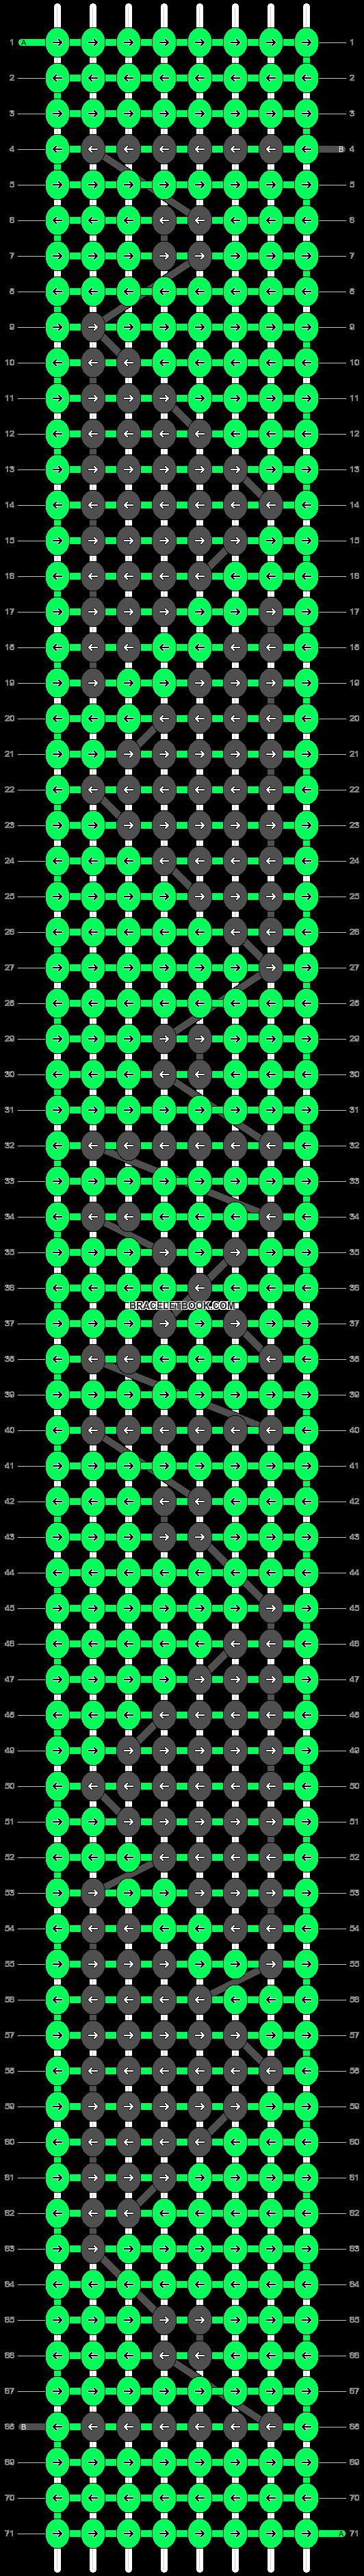 Alpha pattern #19129 pattern